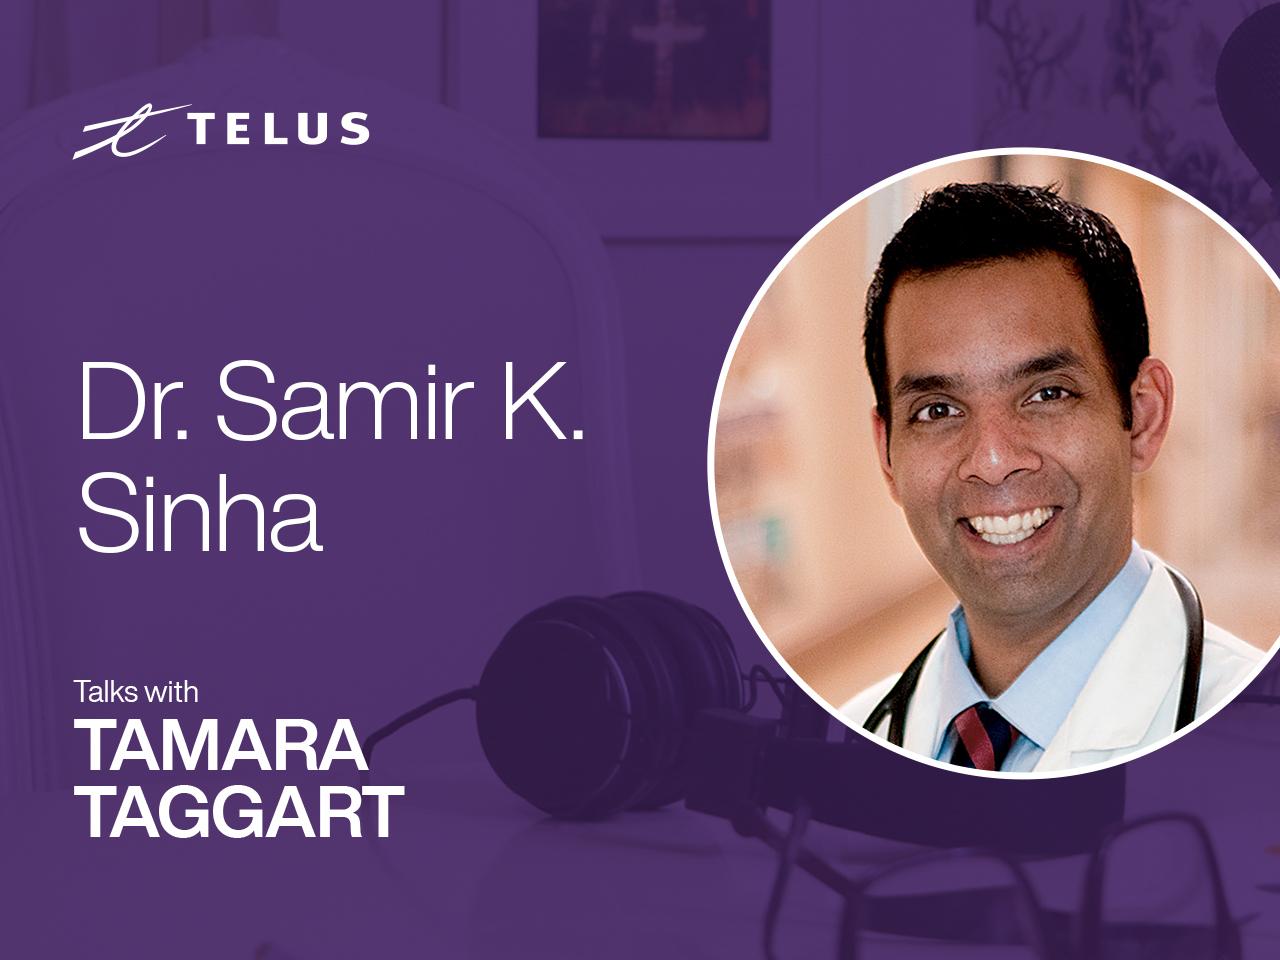 Dr. Samir Sinha, director of geriatrics at Sinai Health in Toronto